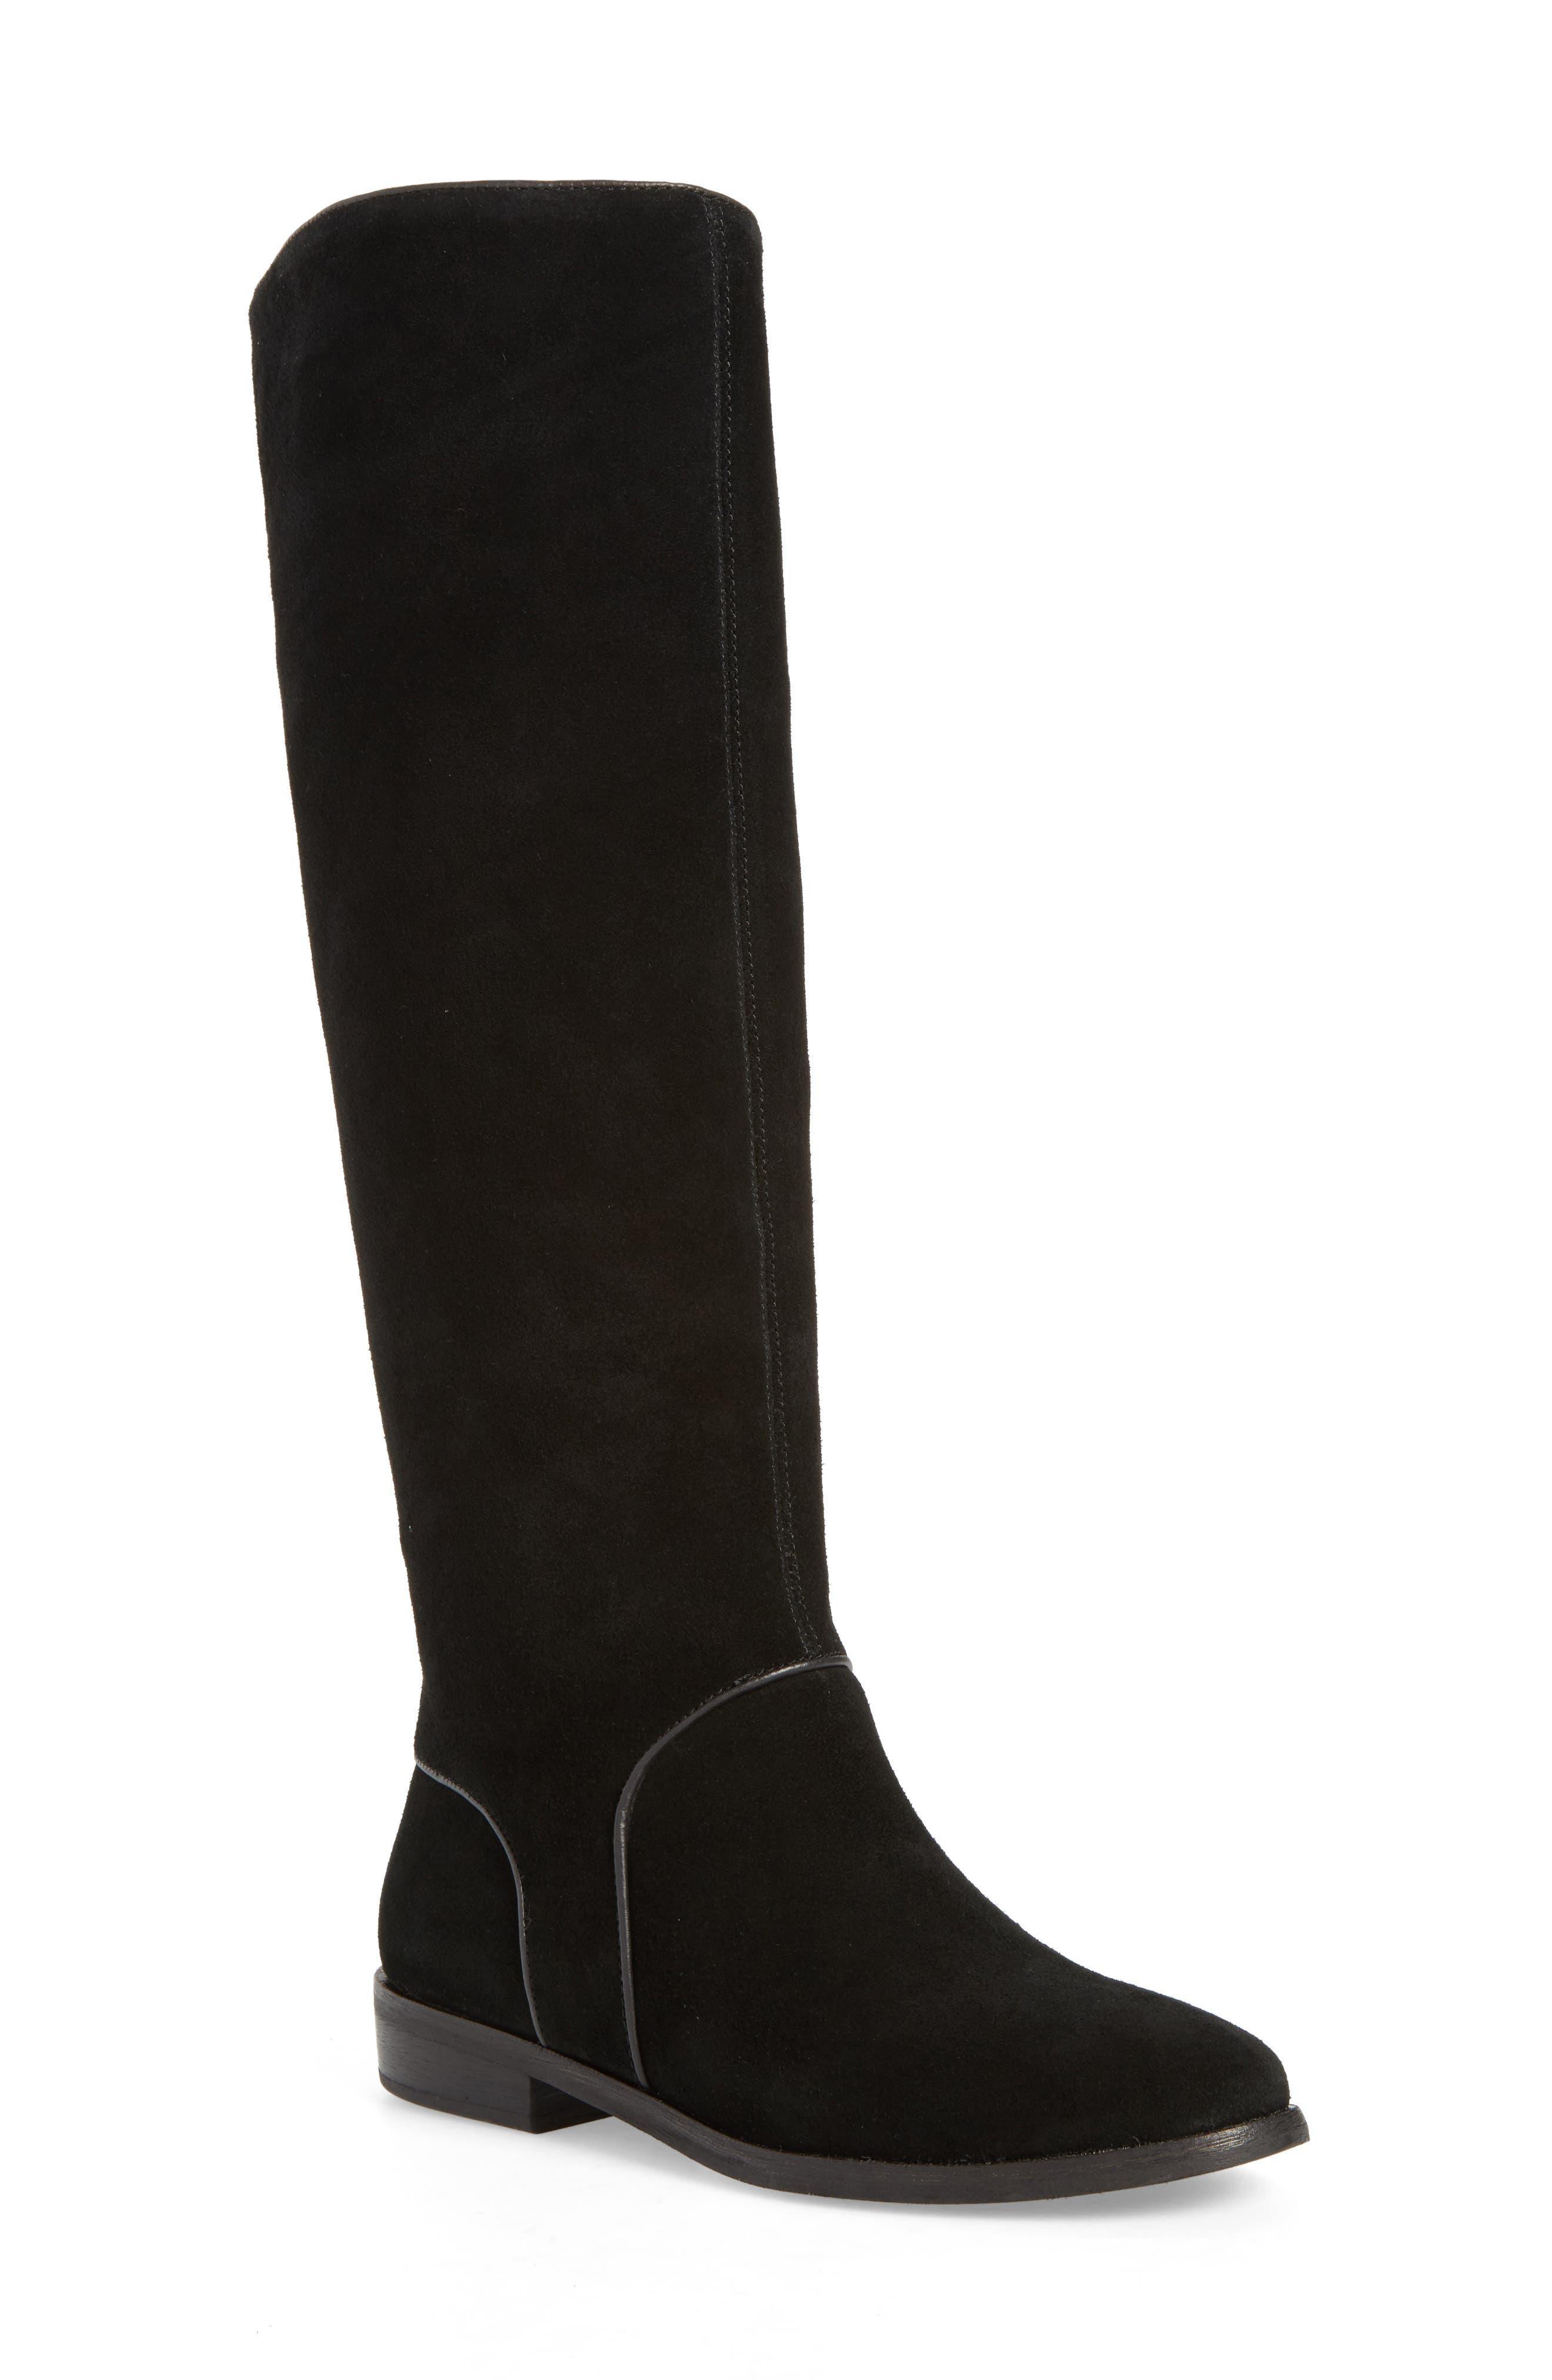 Gracen Knee High Boot,                             Main thumbnail 1, color,                             Black Suede